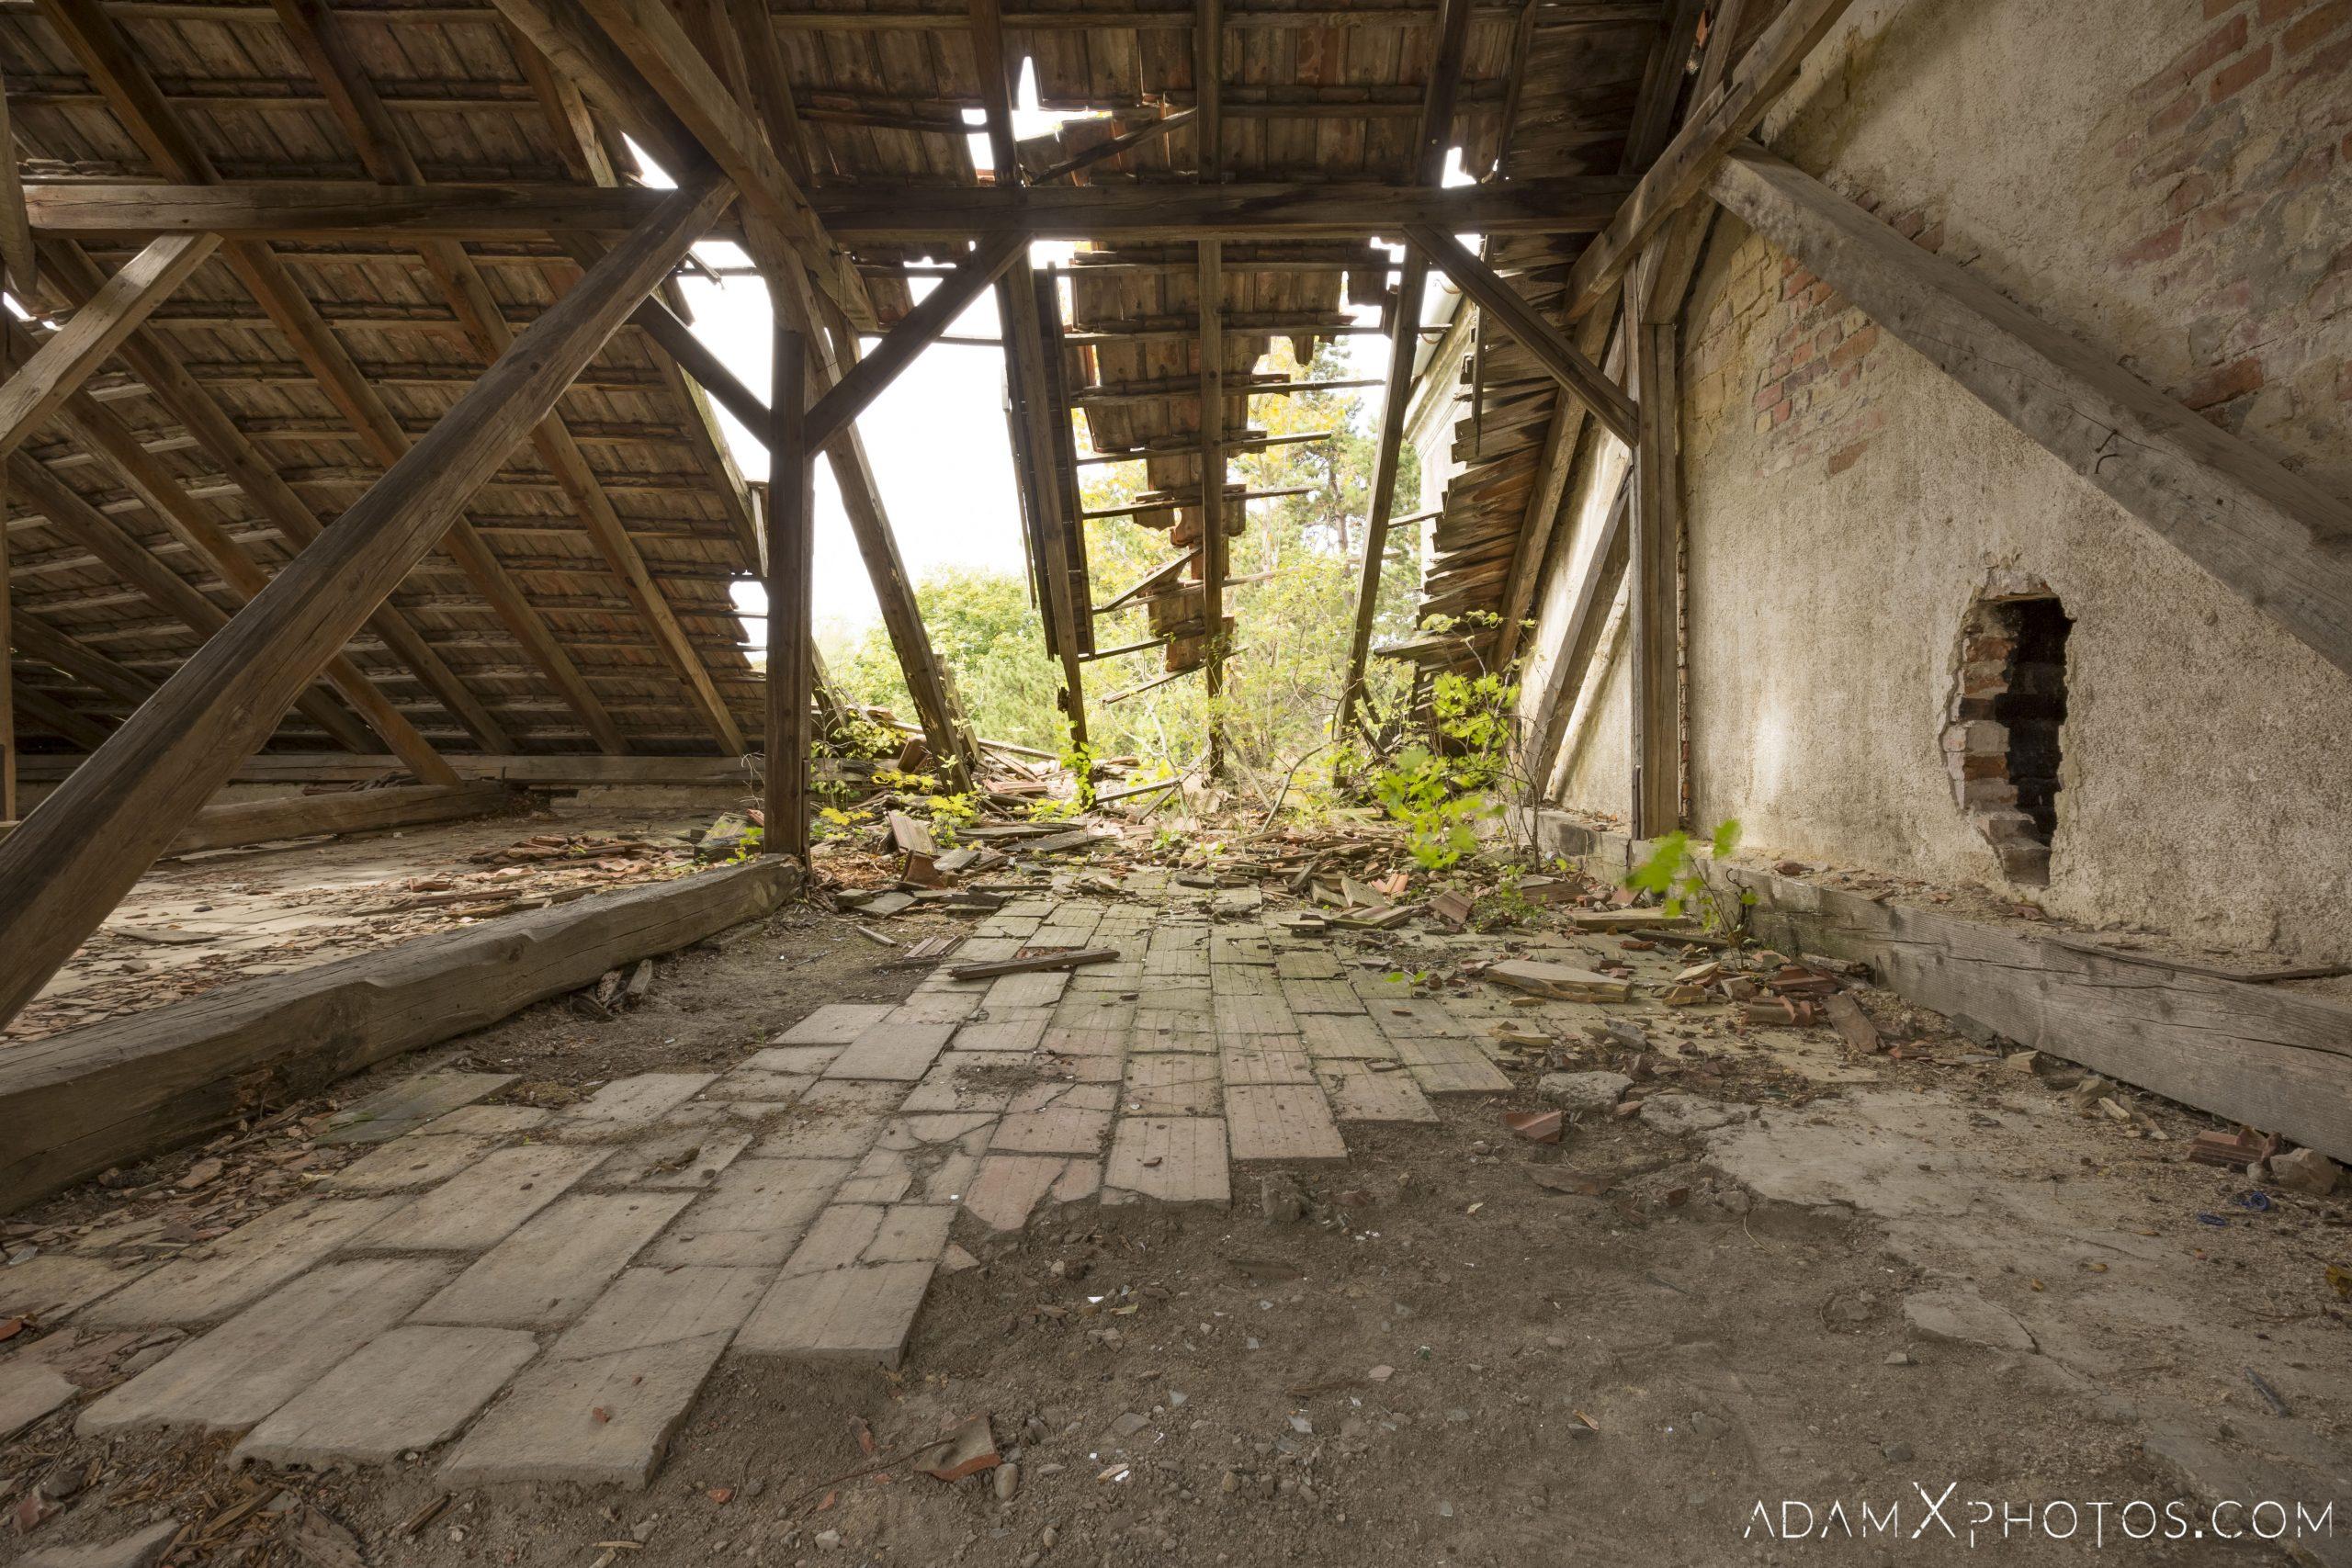 attic broken roof Hajmaskér Barracks Hungary Adam X Urbex Urban Exploration Access 2018 Abandoned decay ruins lost forgotten derelict location creepy haunting eerie